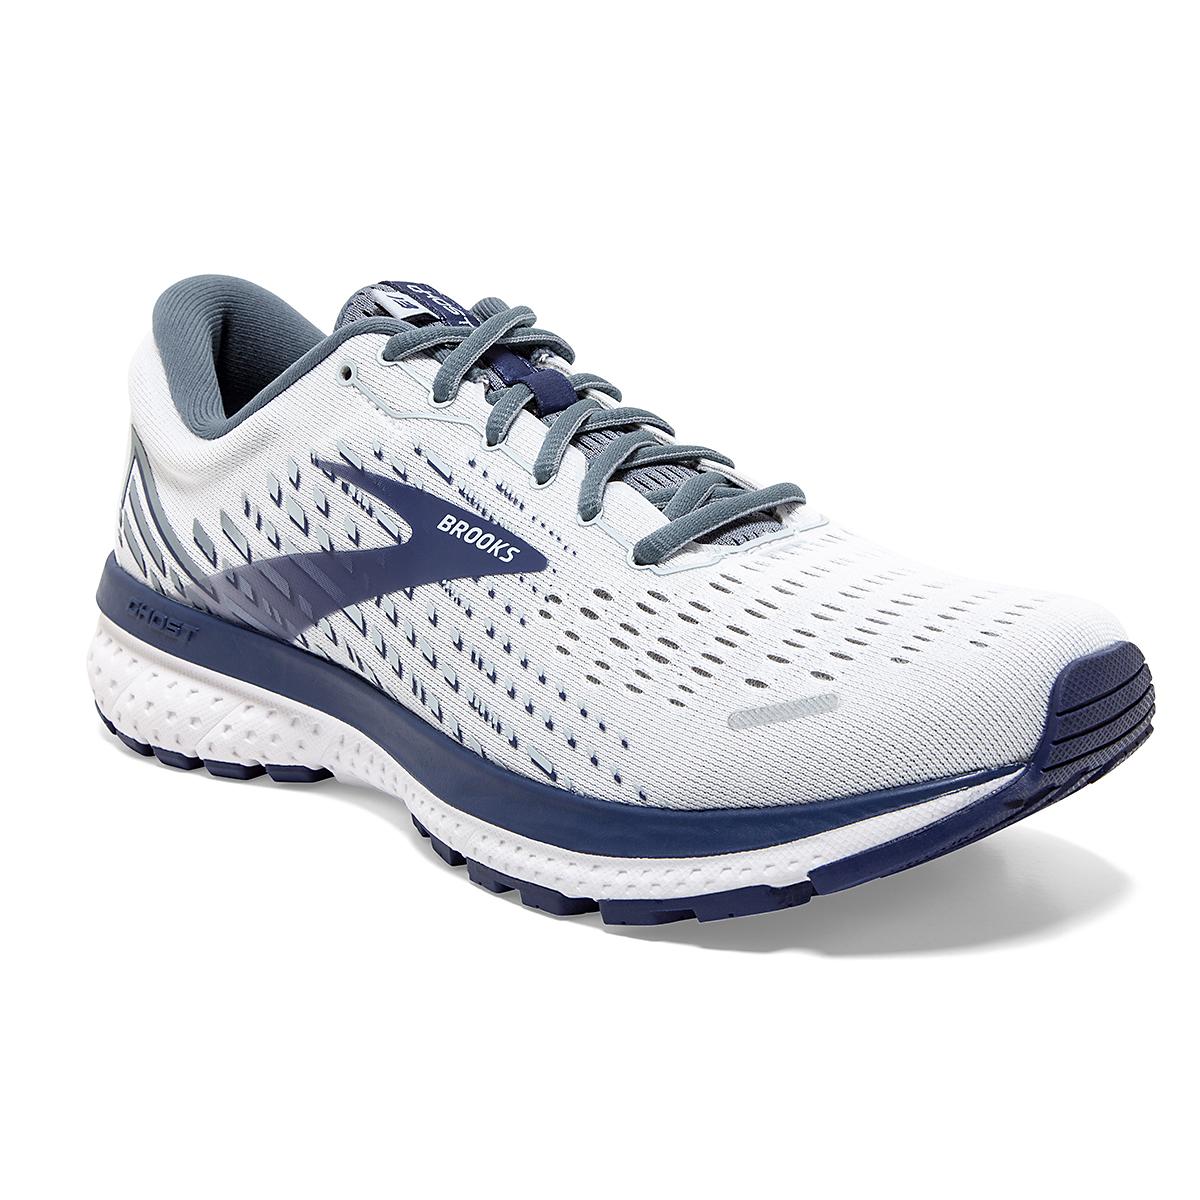 Men's Brooks Ghost 13 Running Shoe - Color: White/Grey/Deep Blue - Size: 7 - Width: Regular, White/Grey/Deep Blue, large, image 5